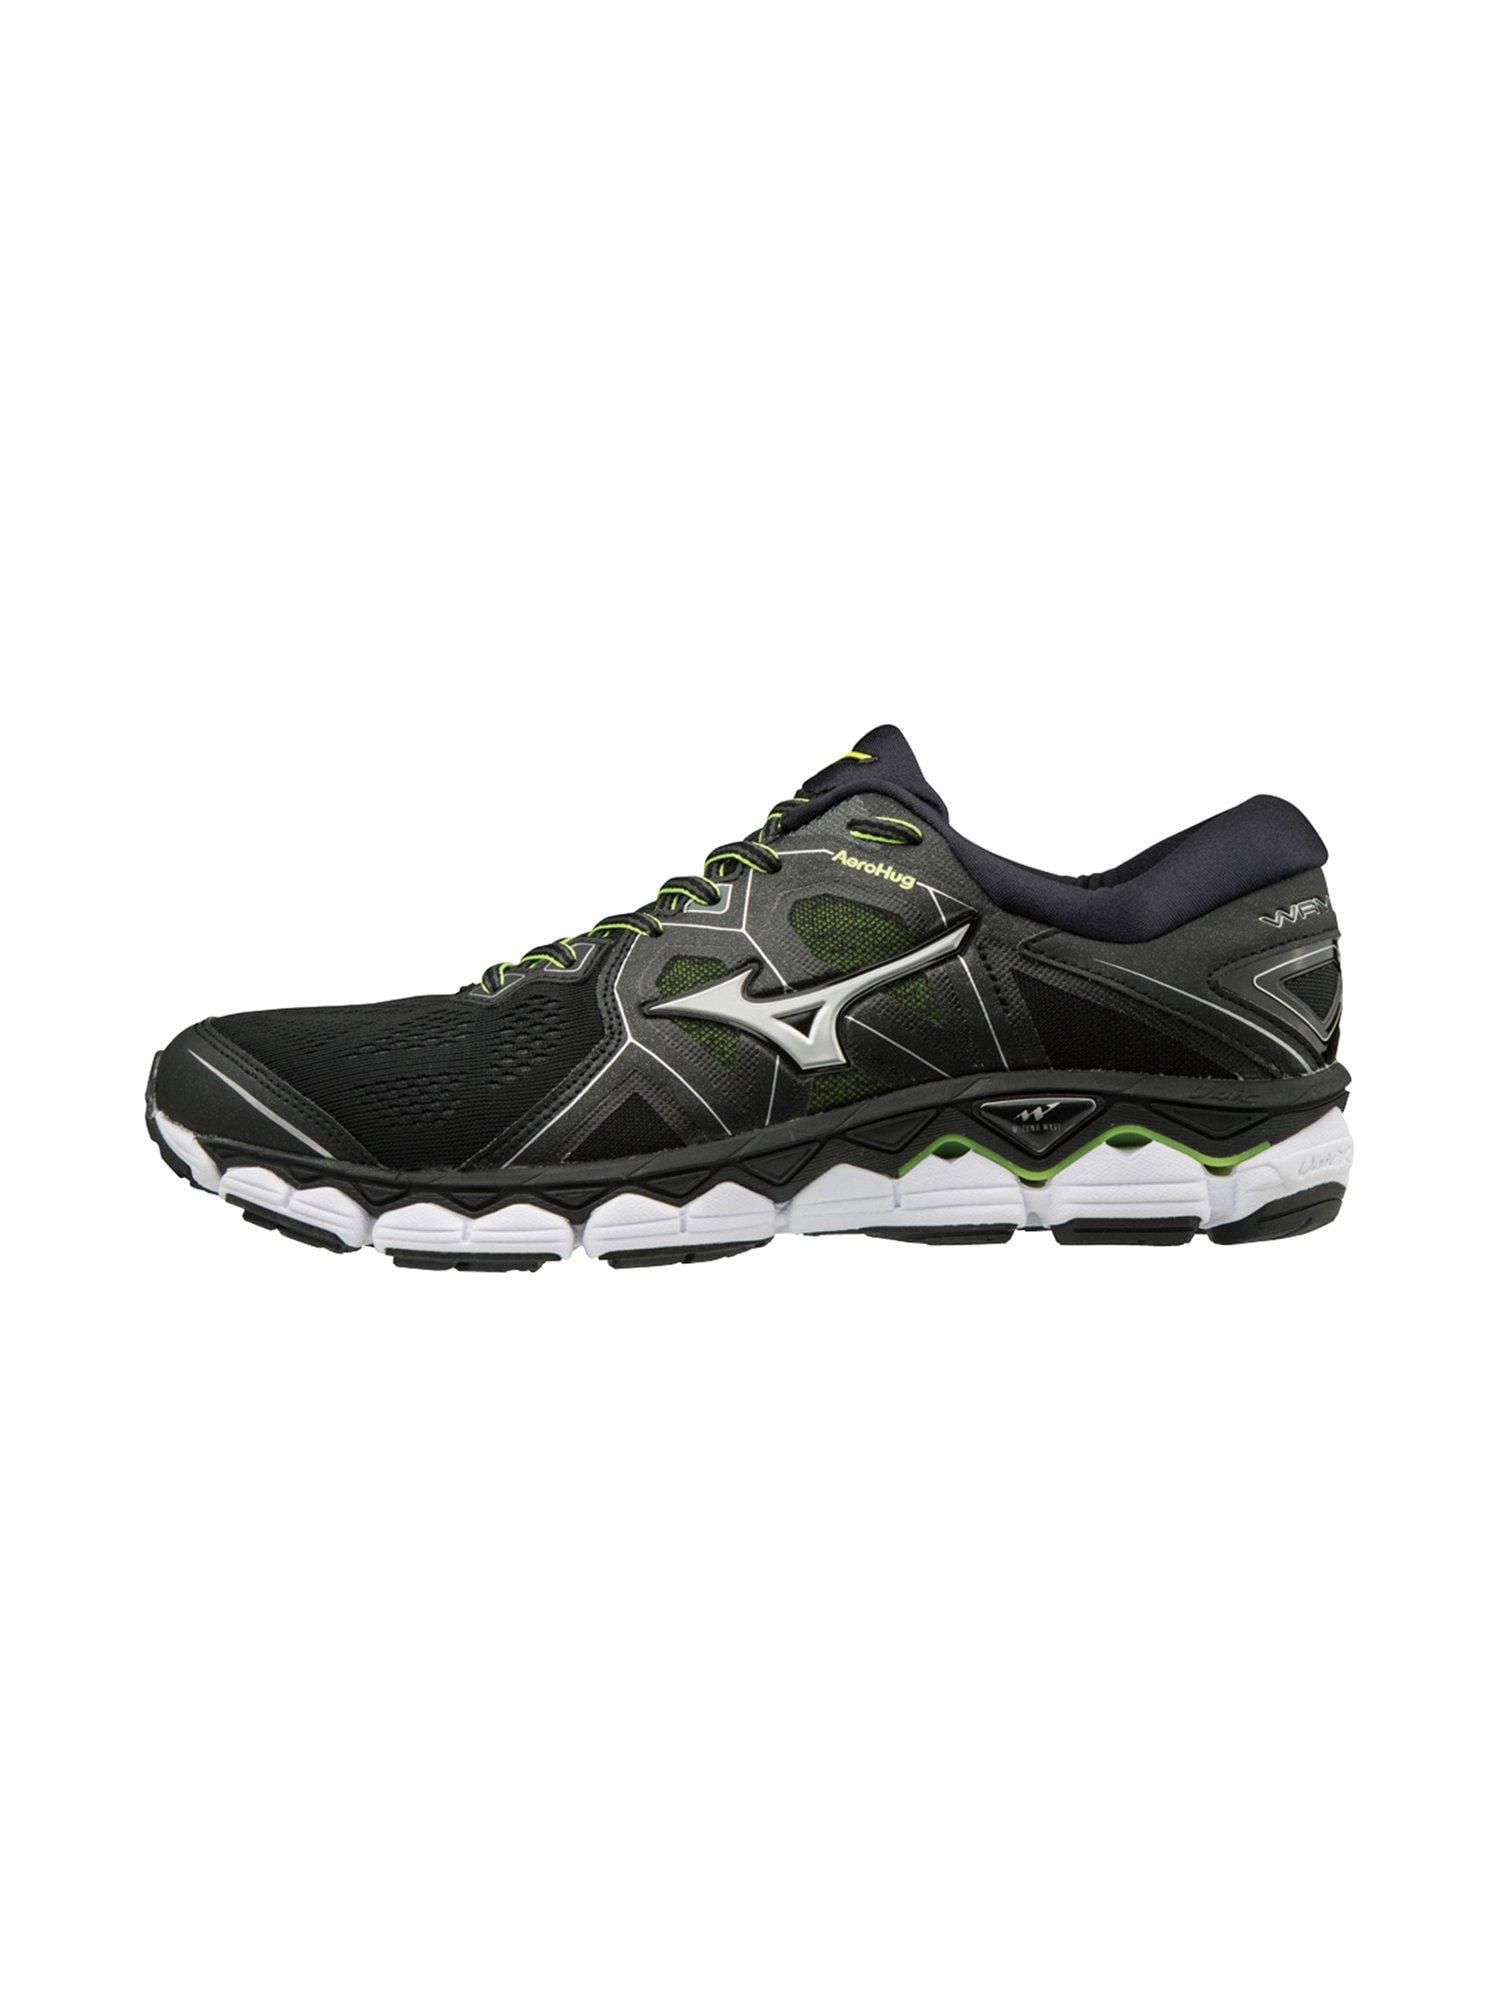 mens mizuno running shoes size 9.5 eu west disney princess